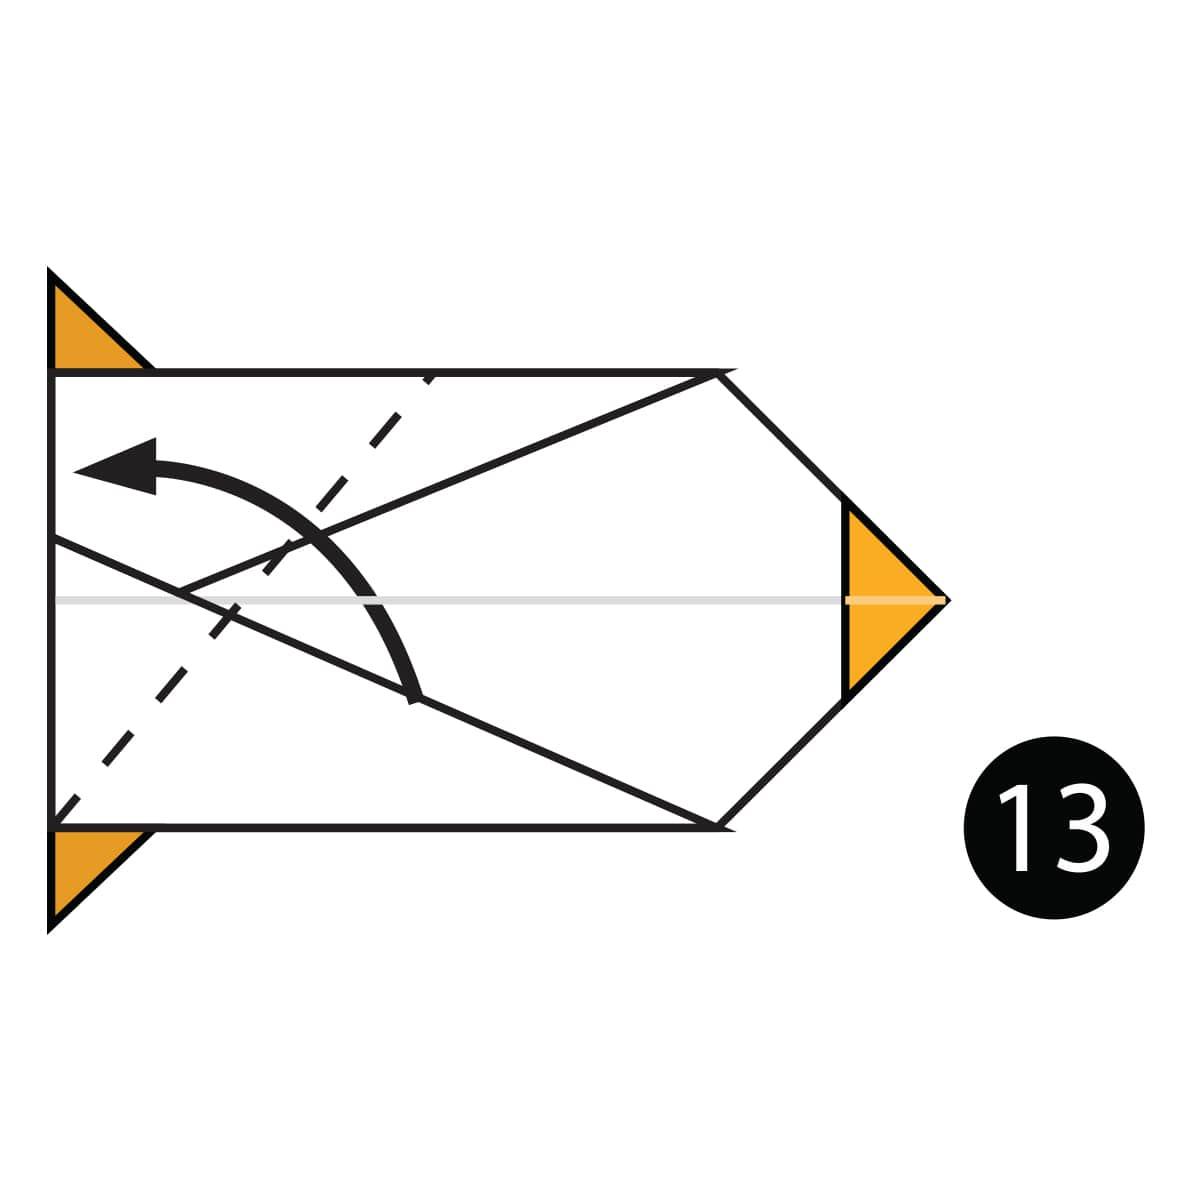 Dachshund Step 13